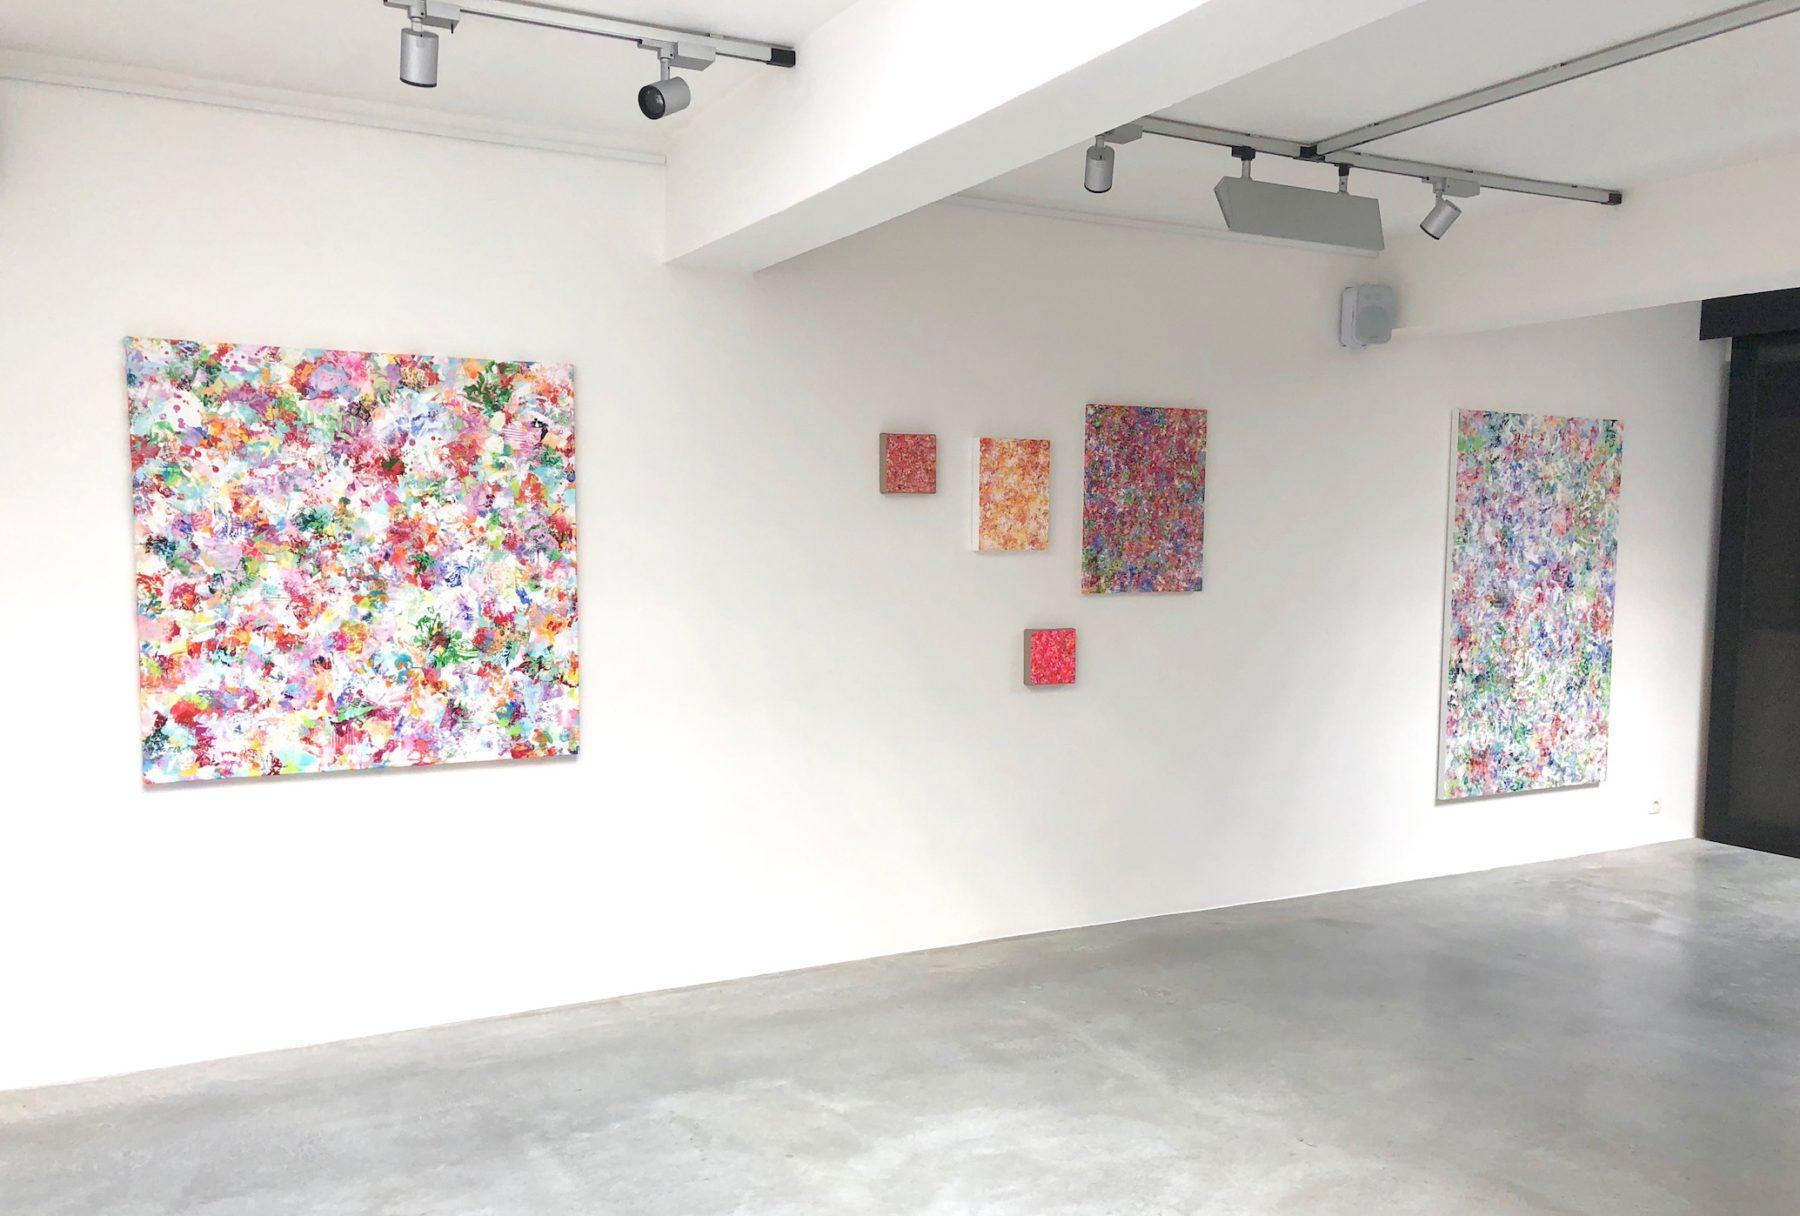 Galerie Rasson Alexandra De Grave